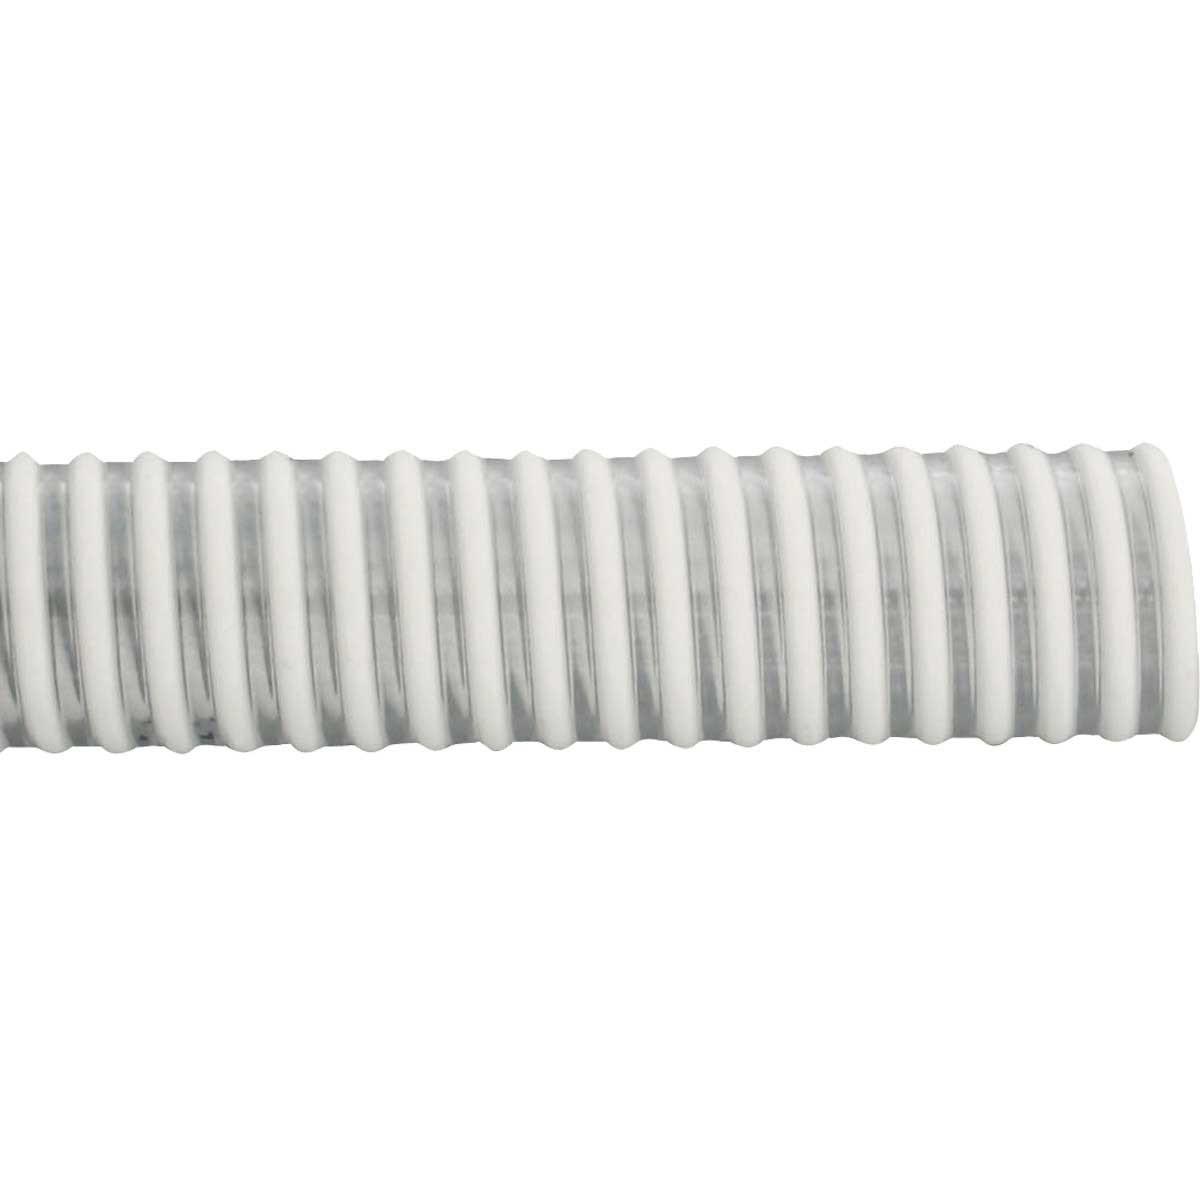 5000028066 Wacker Neuson Flexible Suction Hose 2 inch x 20ft